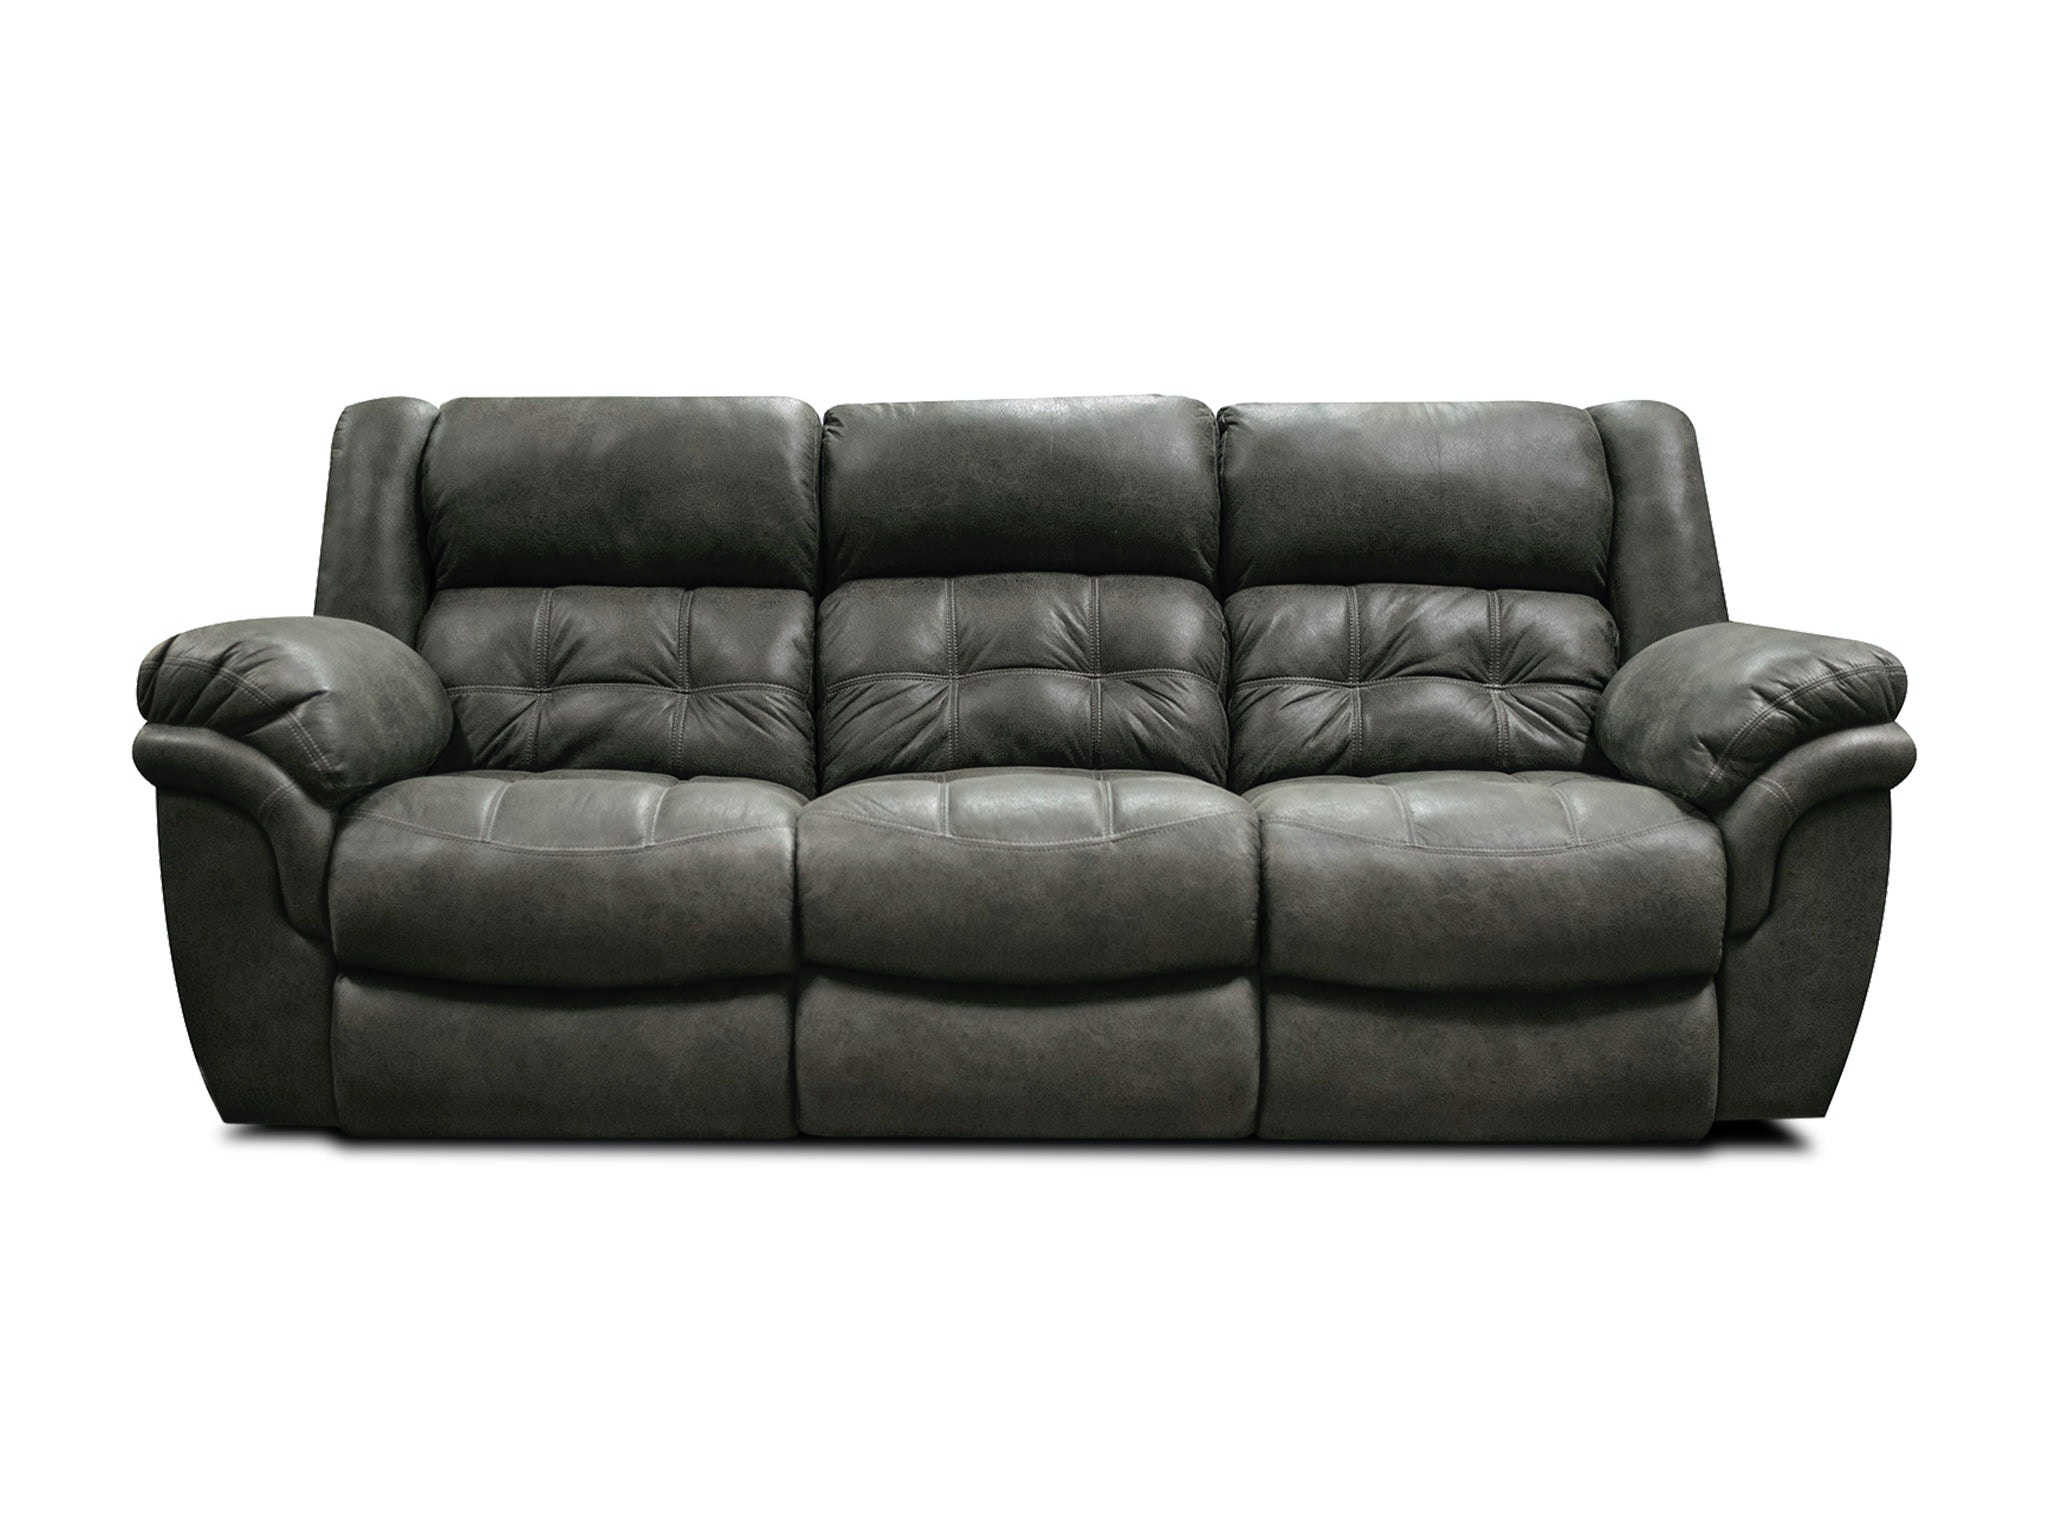 England Living Room Double Reclining Sofa